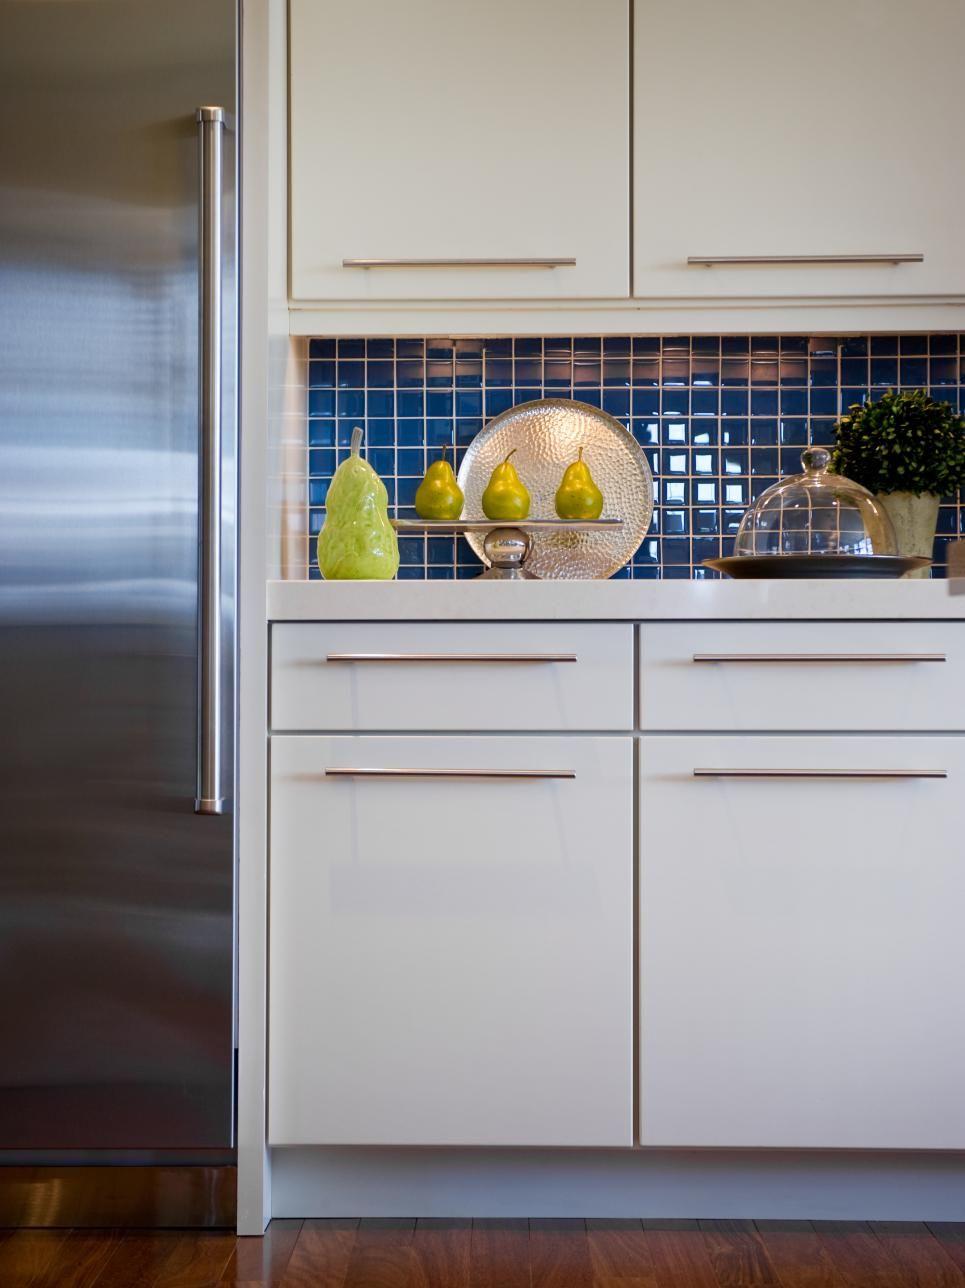 Pictures of kitchen backsplash ideas from backsplash ideas